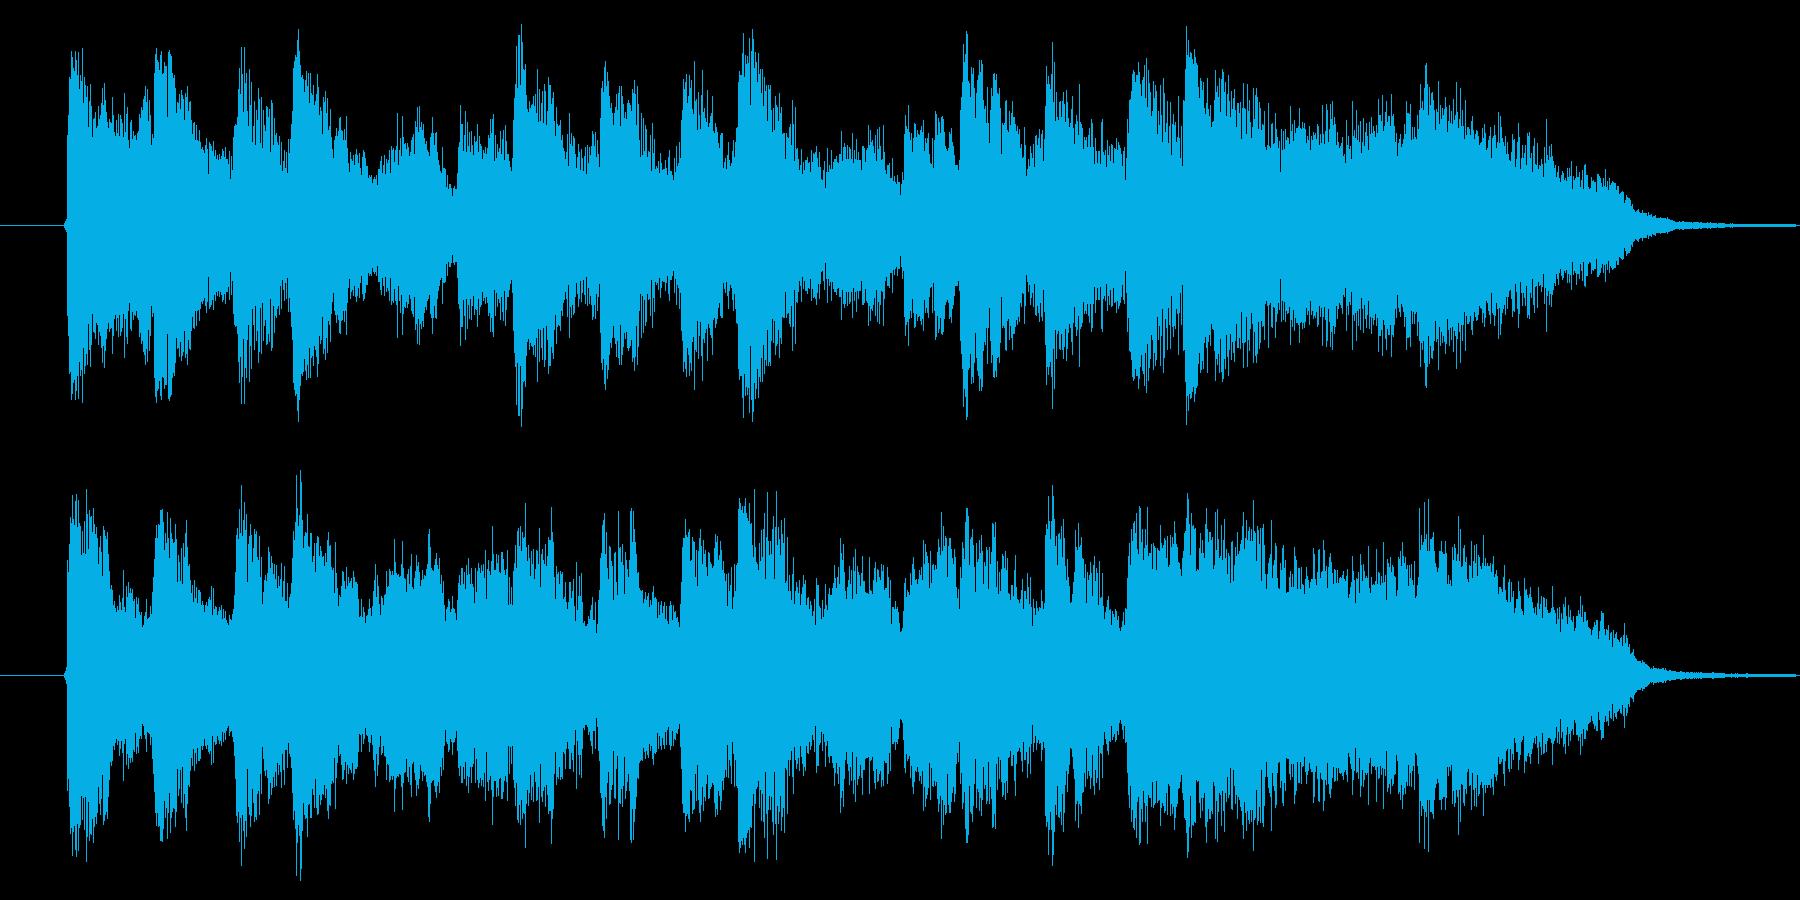 IT系企業のCM用に制作したBGMです…の再生済みの波形